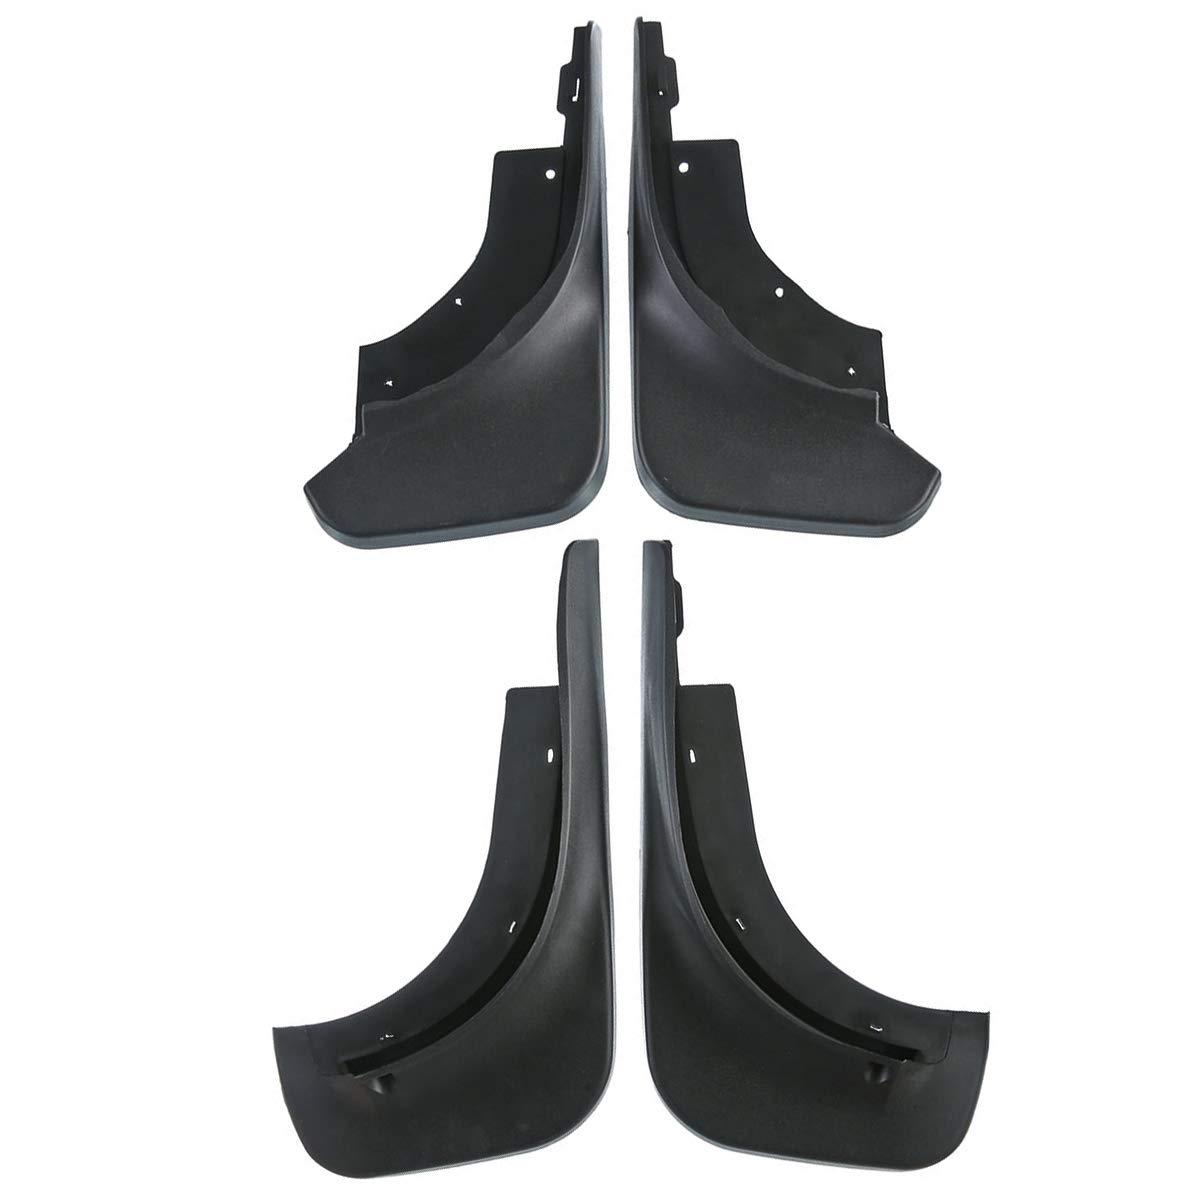 A-Premium Mud Flaps Splash Guards For Volkswagen Touareg 2007-2010 4-PC Set PremiumpartsWhosale